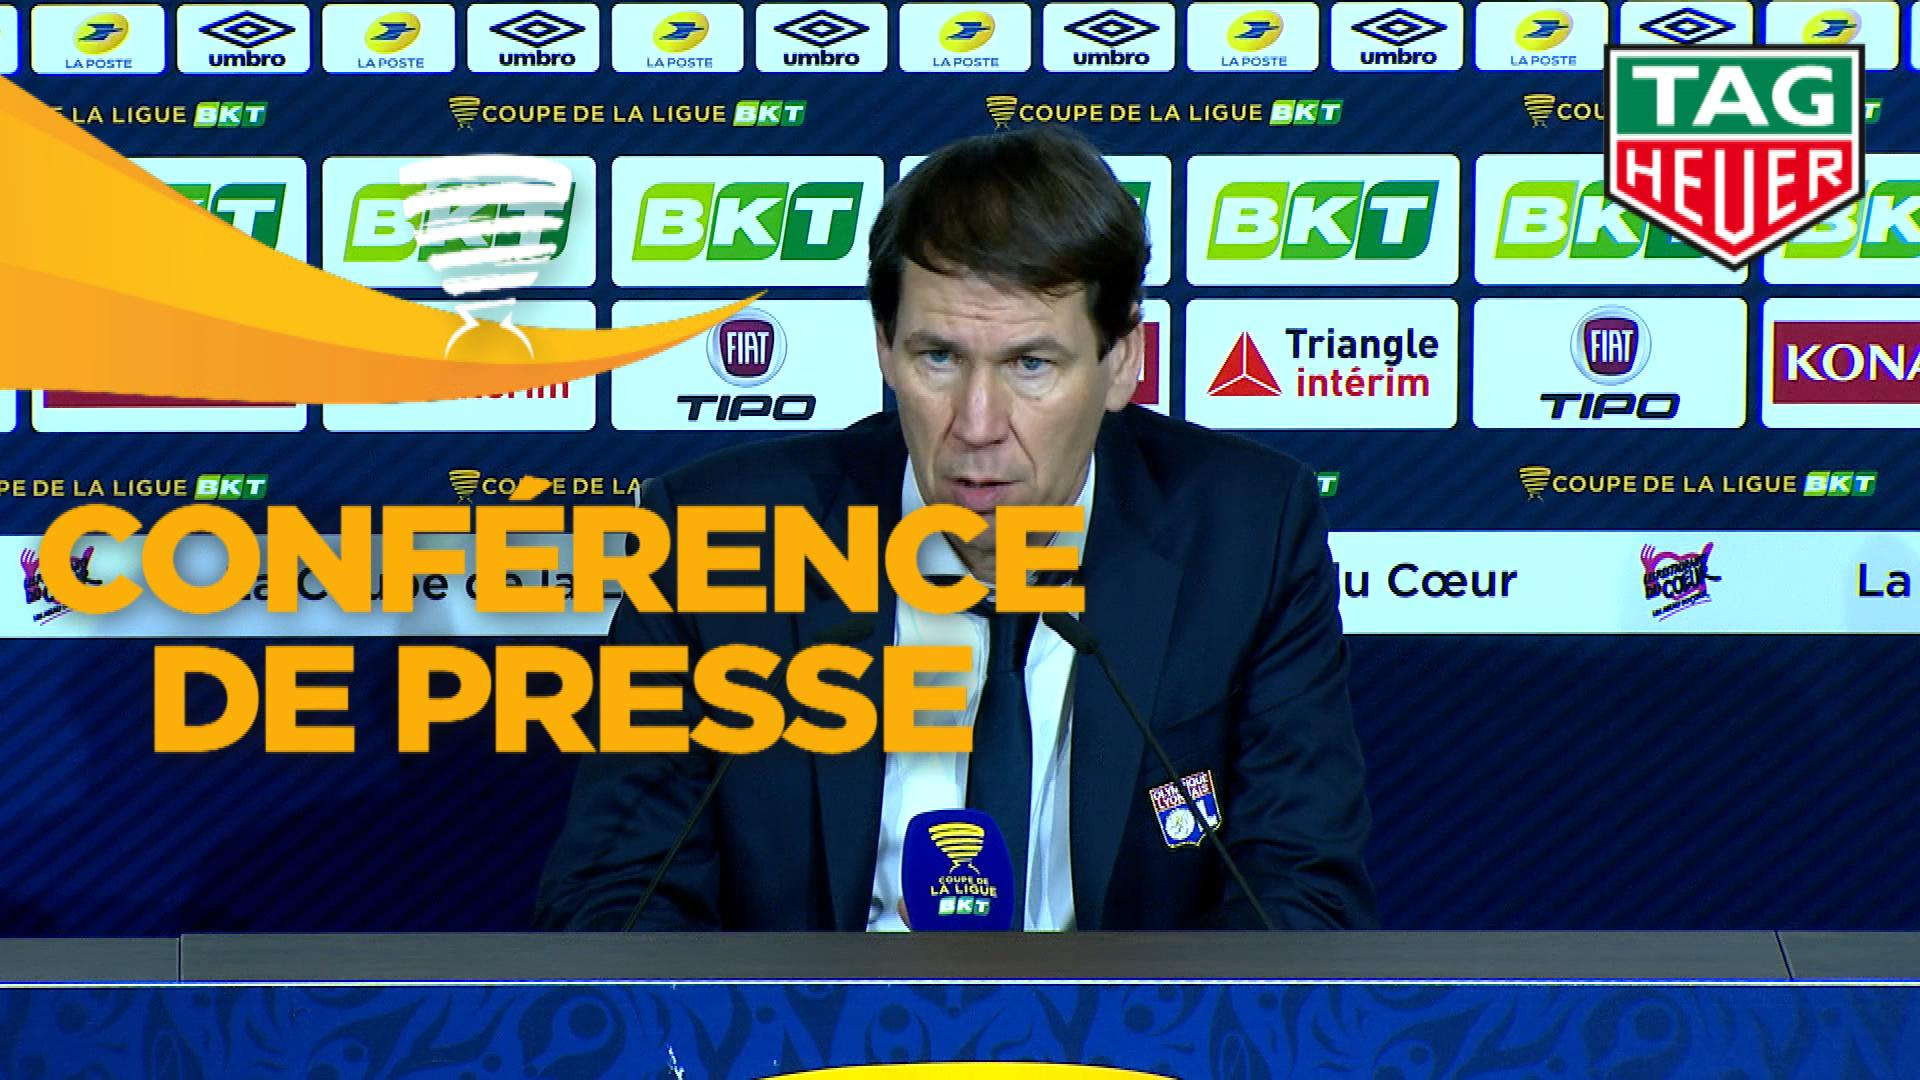 Conférence de presse Olympique Lyonnais - LOSC (2-2 4 tab à 3) : Rudi GARCIA (OL) - Christophe  GALTIER (LOSC) - 2019/2020